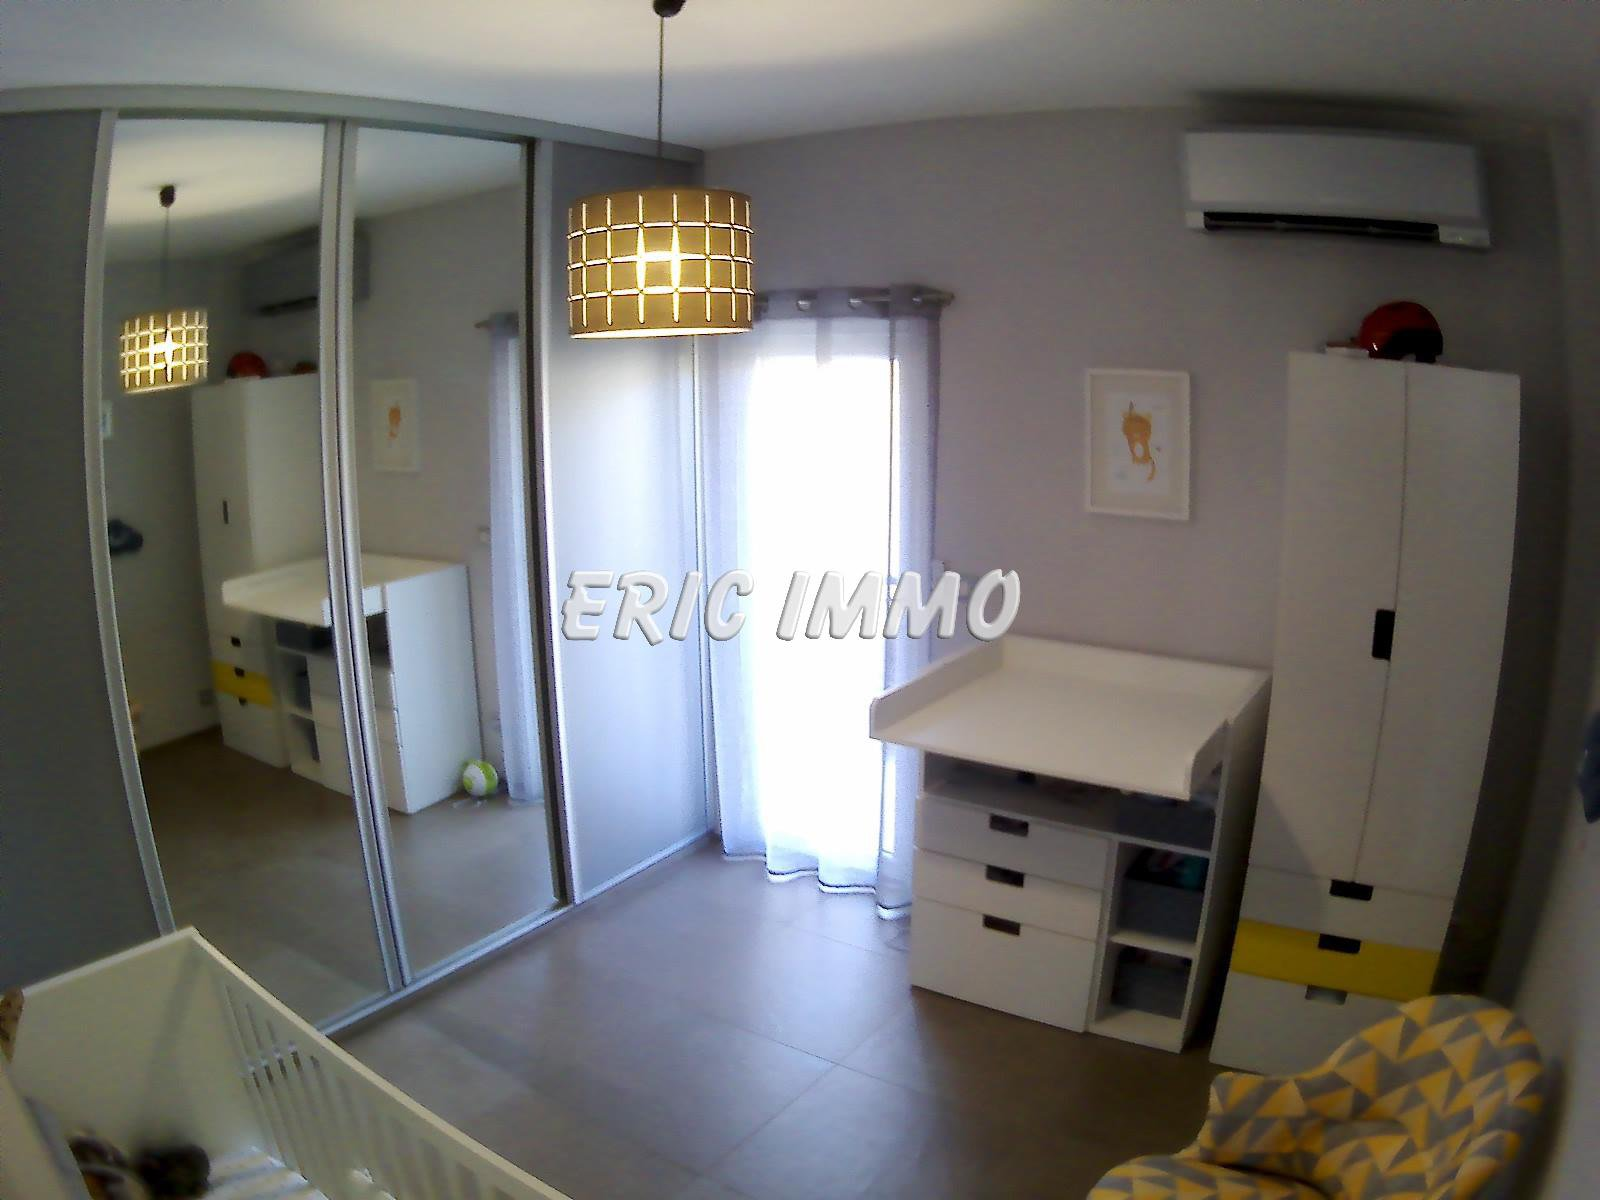 NICE MADELEINE - Maison Niçoise 70 m2